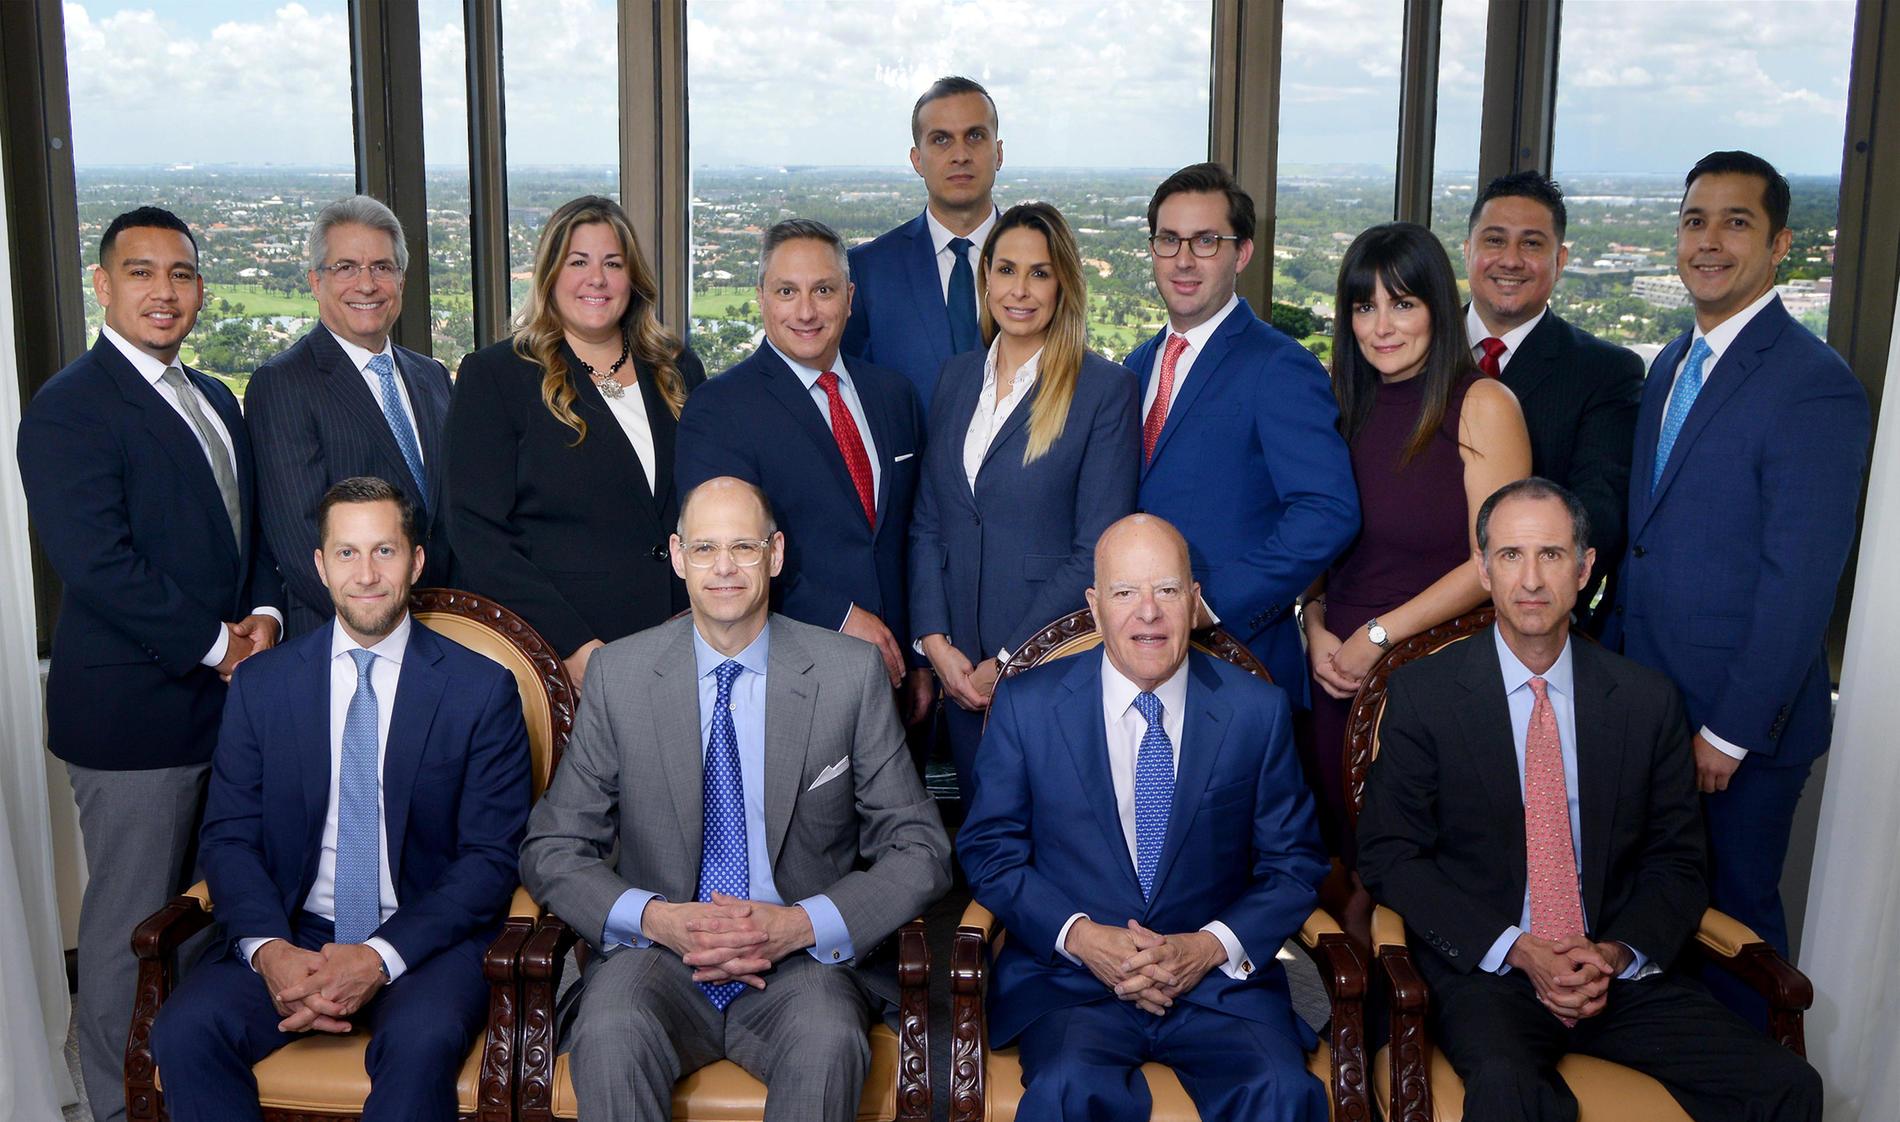 Bermont Carlin Wealth Management | Coral Gables, FL | Morgan